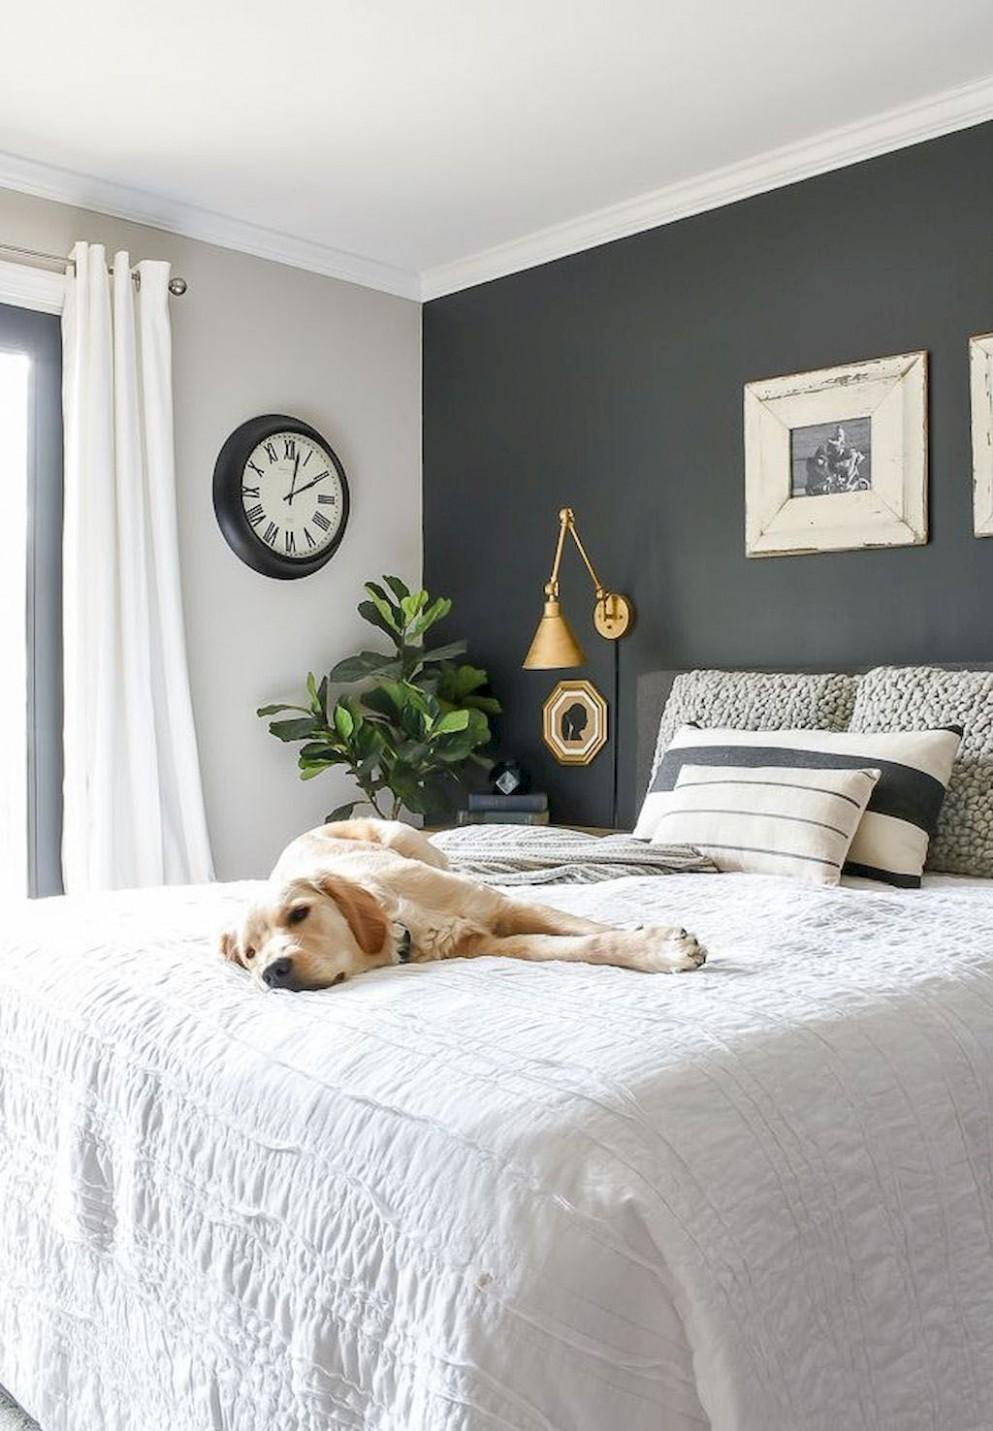 Finest grey bedroom decor ideas pinterest to refresh your home  - Bedroom Ideas Pinterest Grey